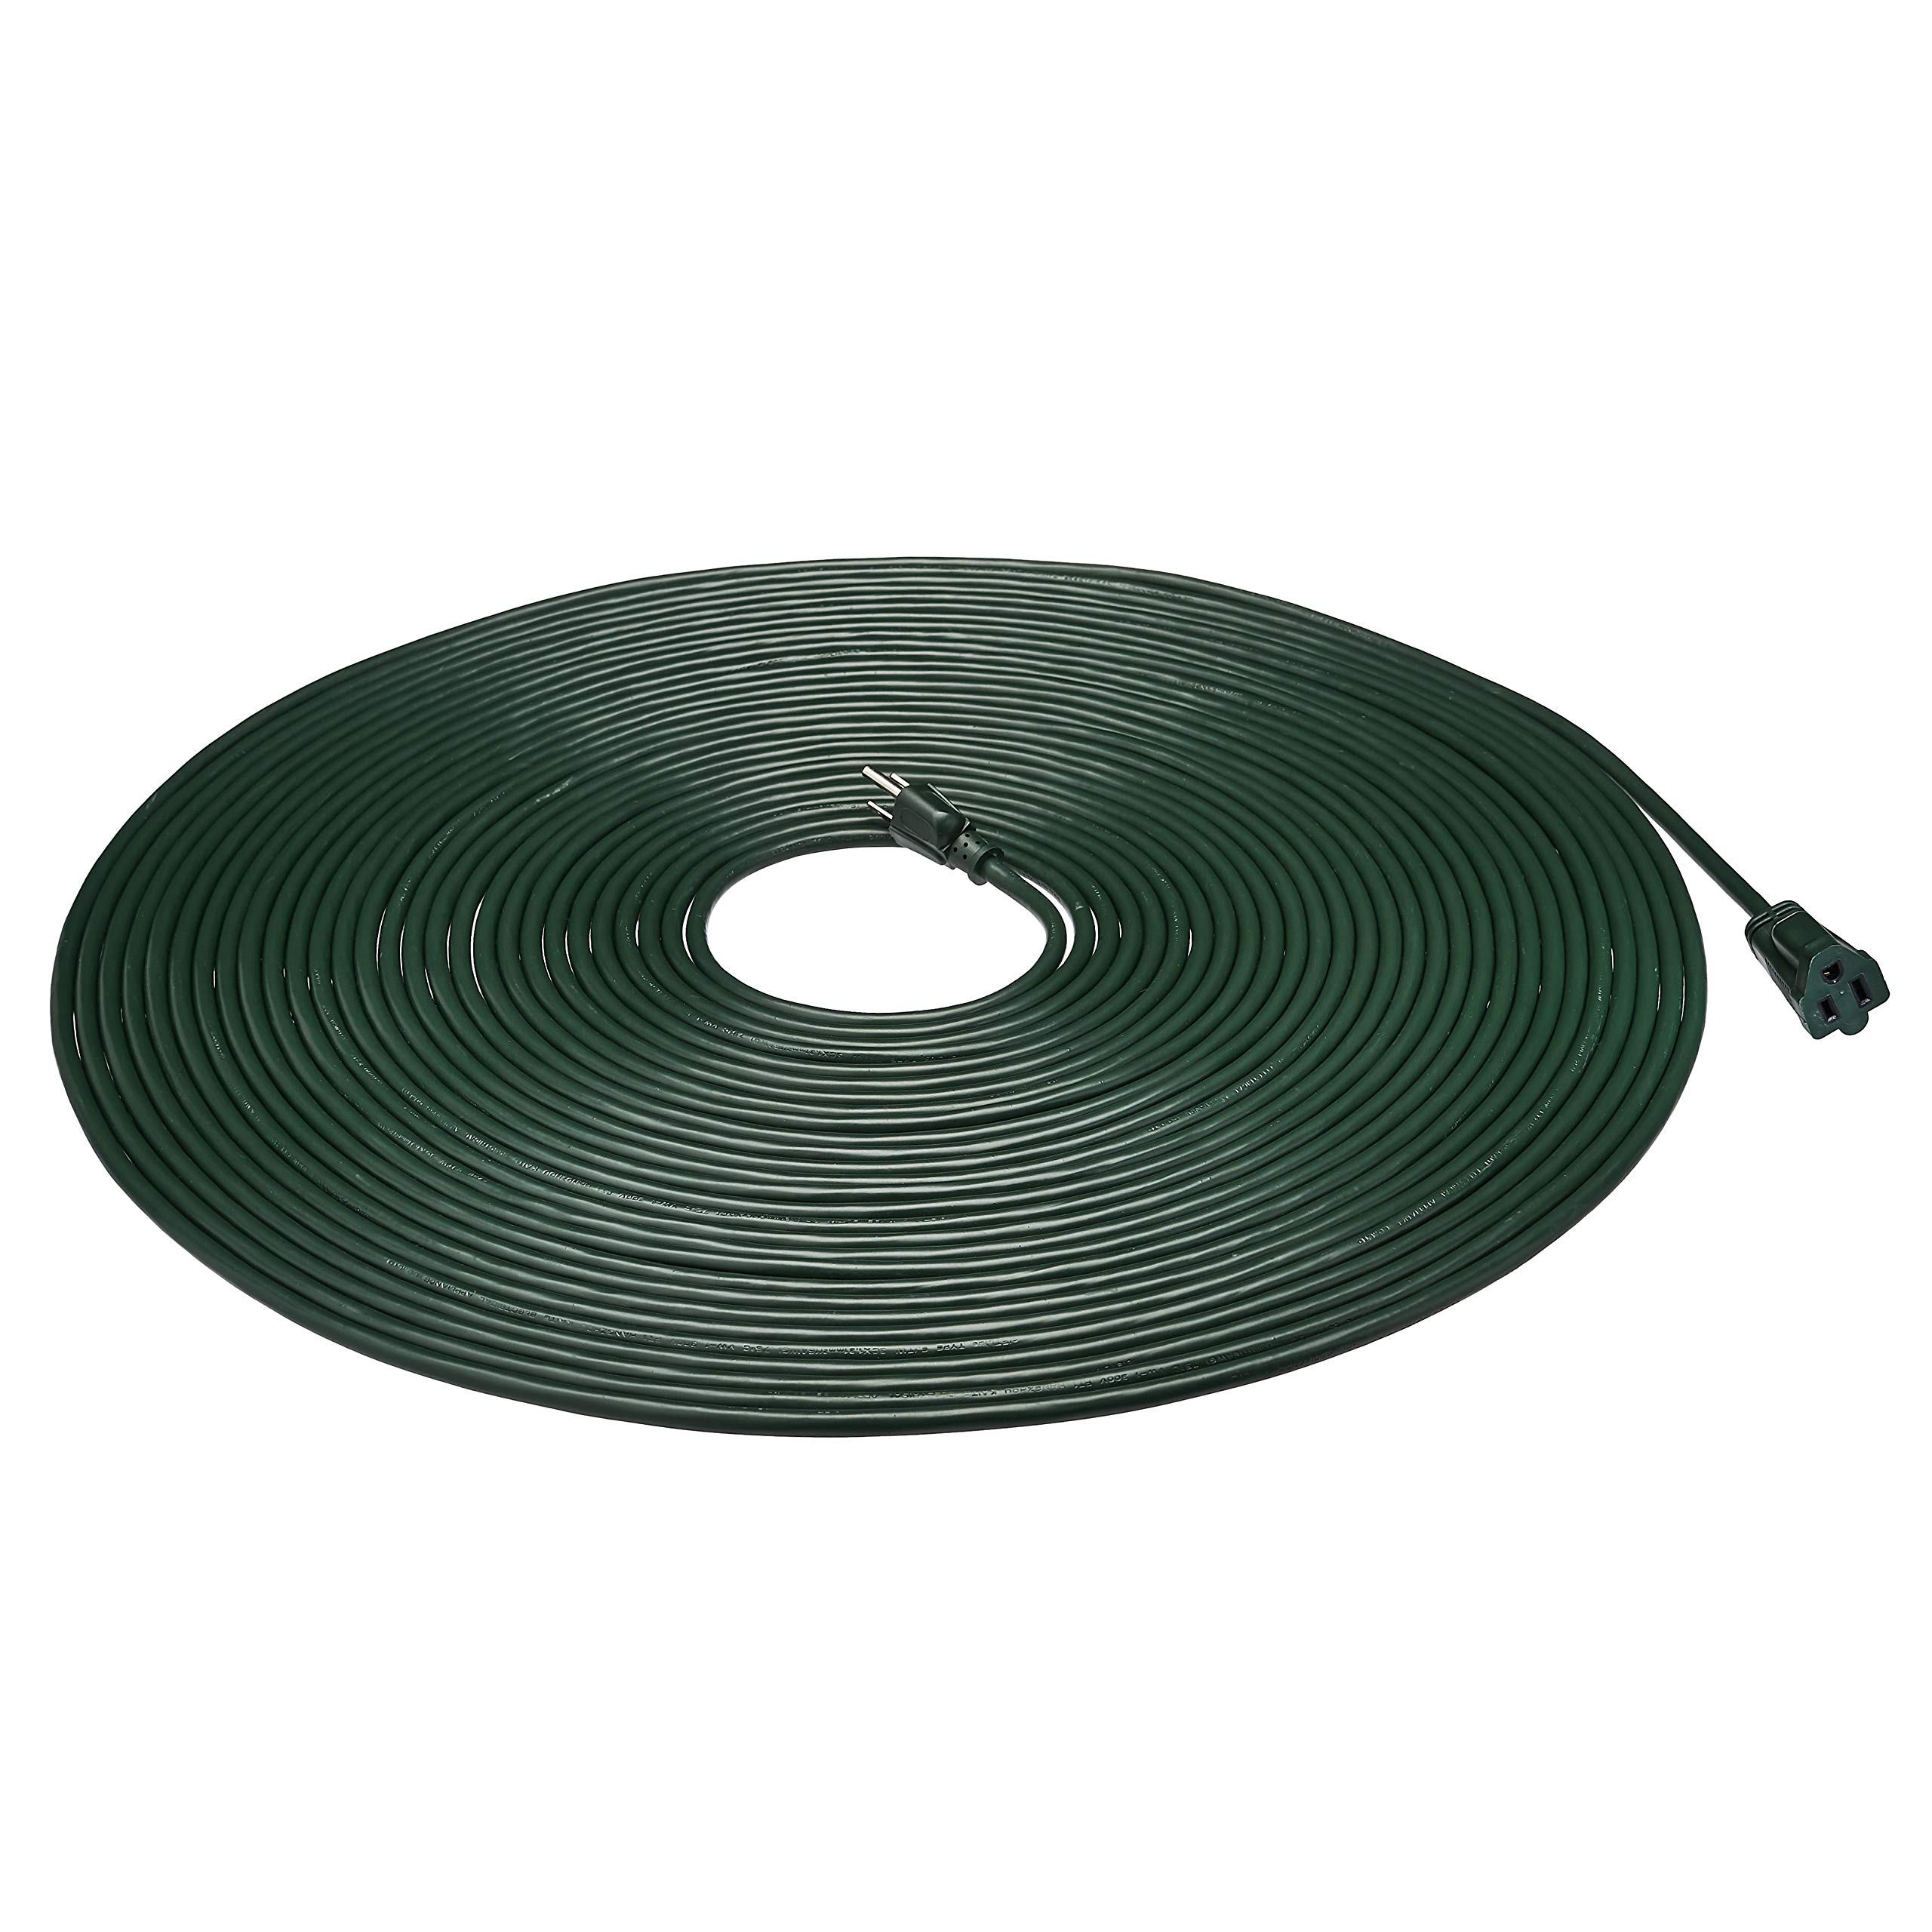 AmazonBasics 16/3 Vinyl Outdoor Extension Cord | Green, 100-Foot